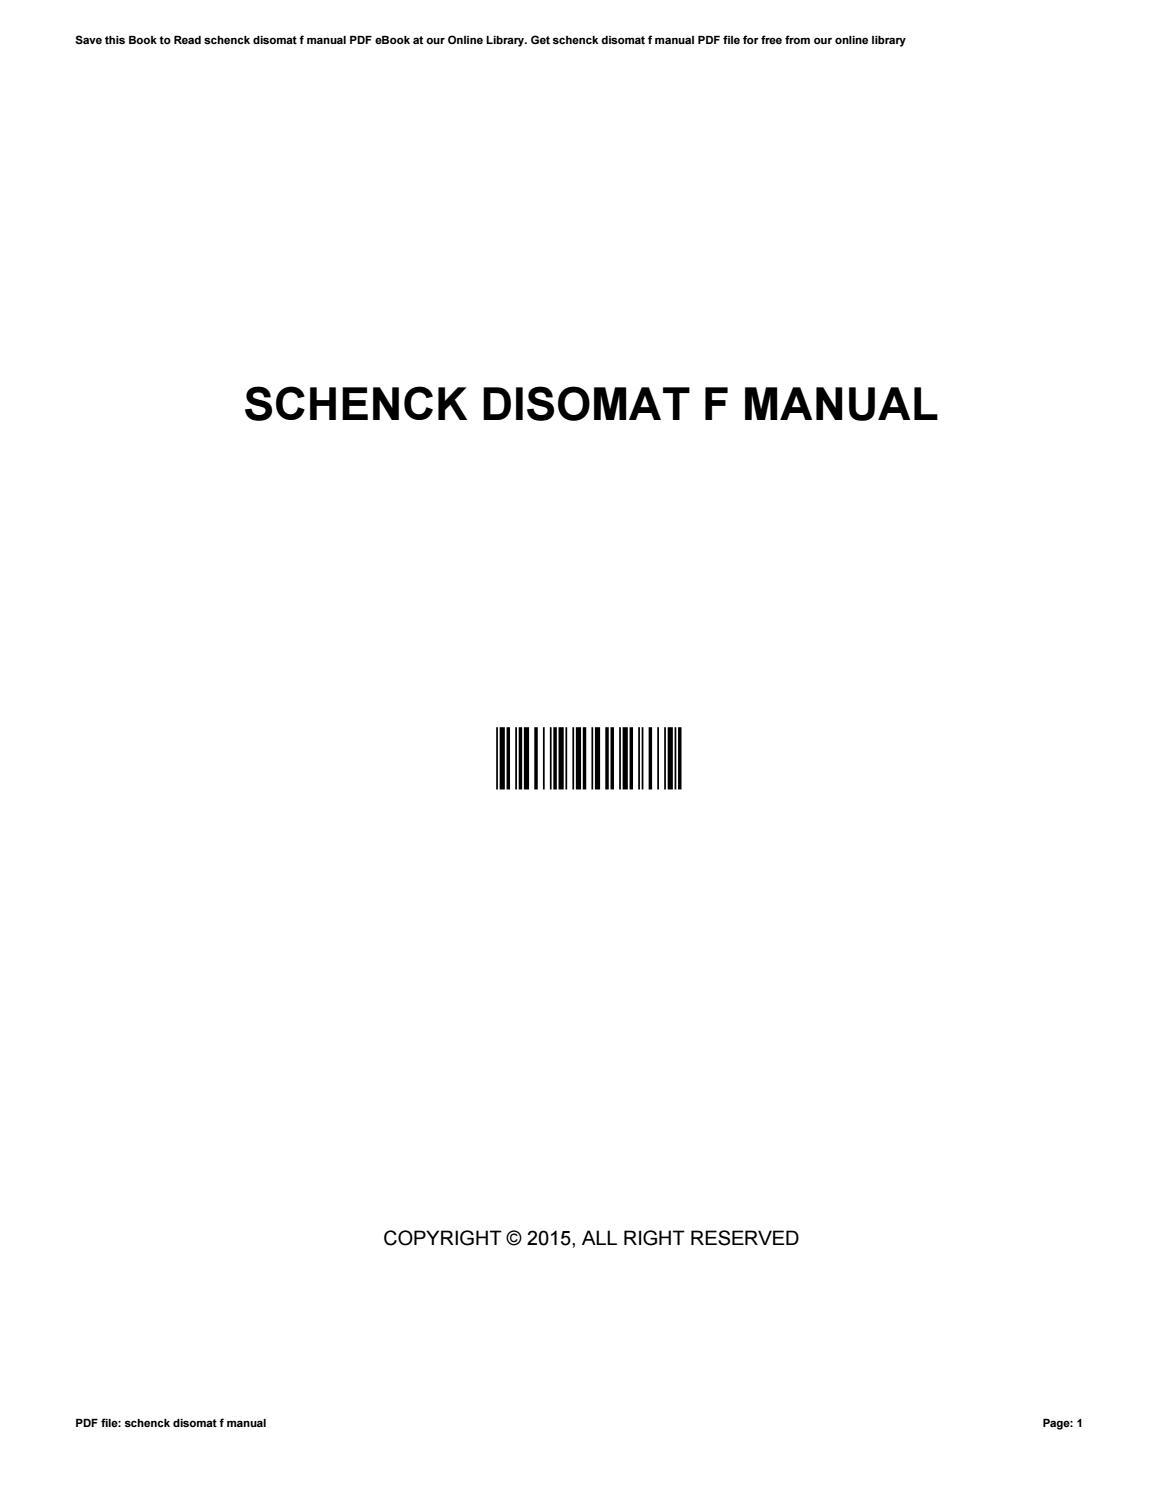 schenck disomat f manual browse manual guides u2022 rh megaentertainment us Owner's Manual User Manual Template